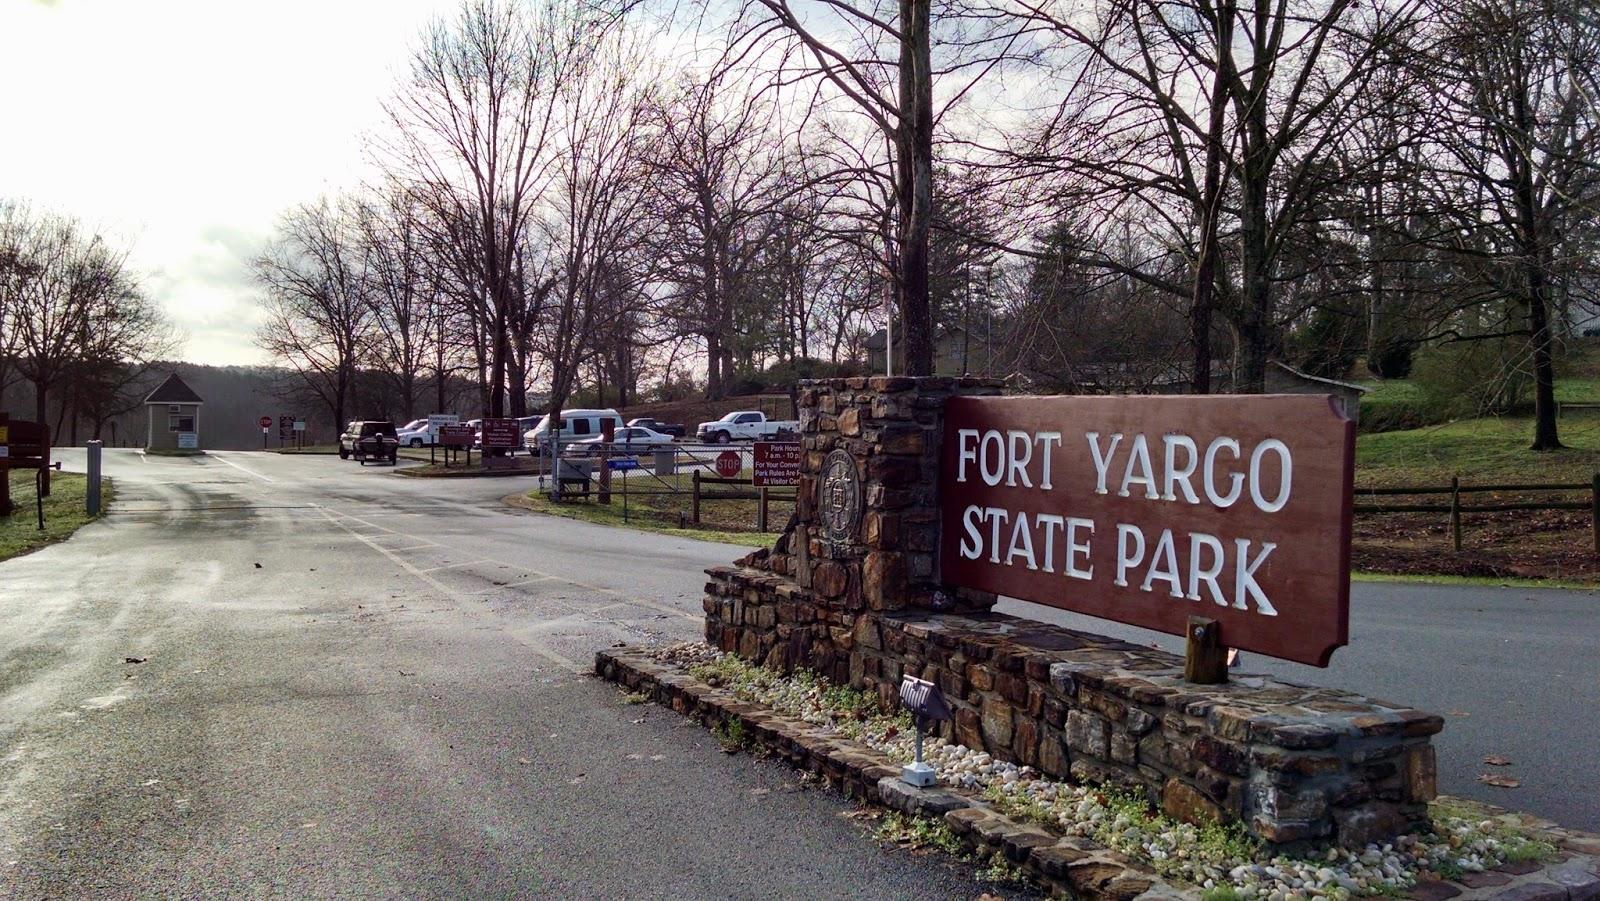 Fort Yargo State Park Winder GA